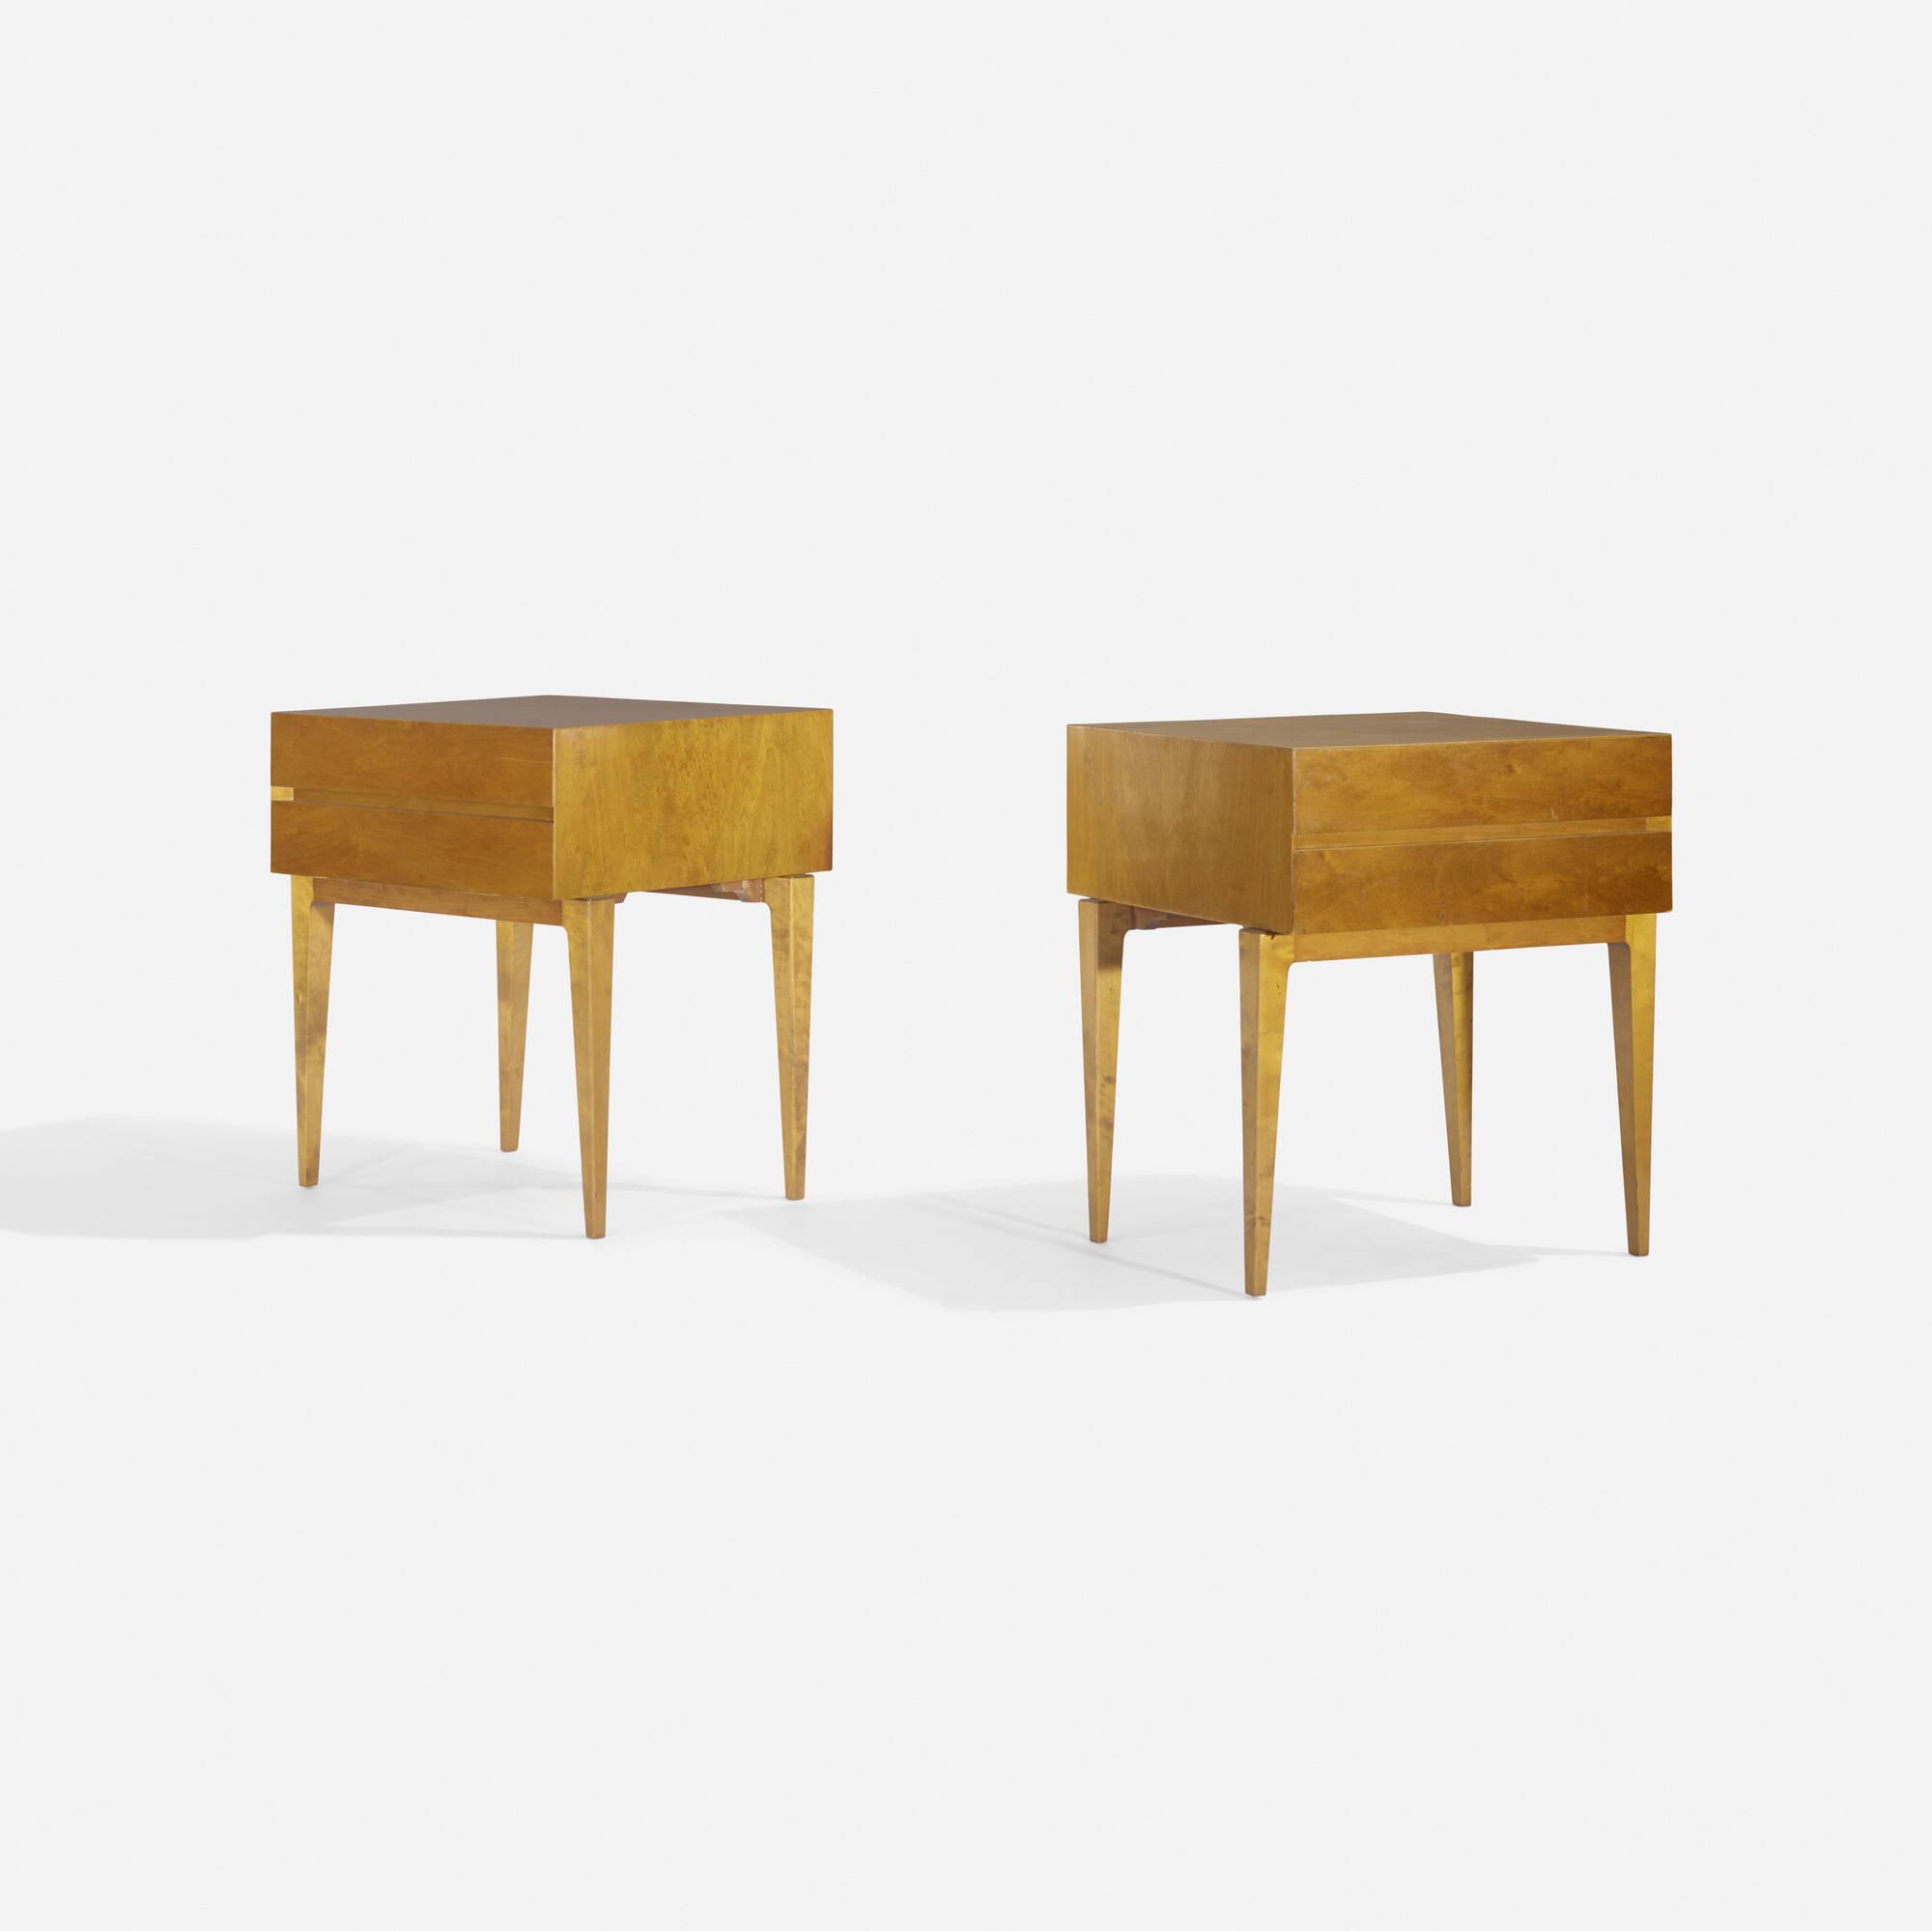 113: Swedish / nightstands, pair (1 of 3)